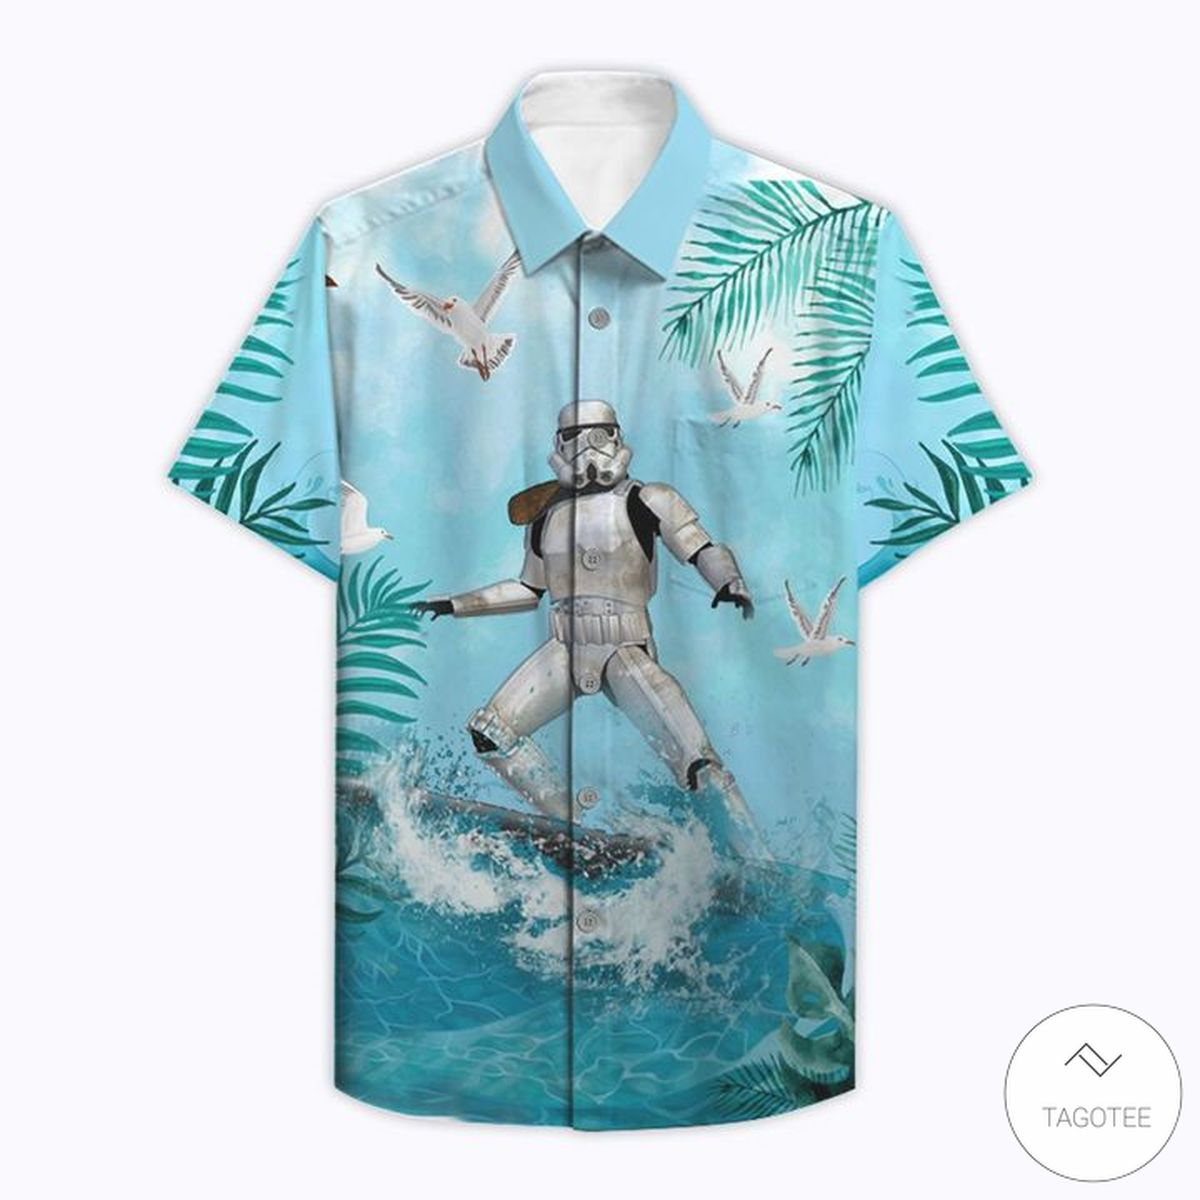 3D Star Wars Stormtrooper Surfing Hawaiian Shirt